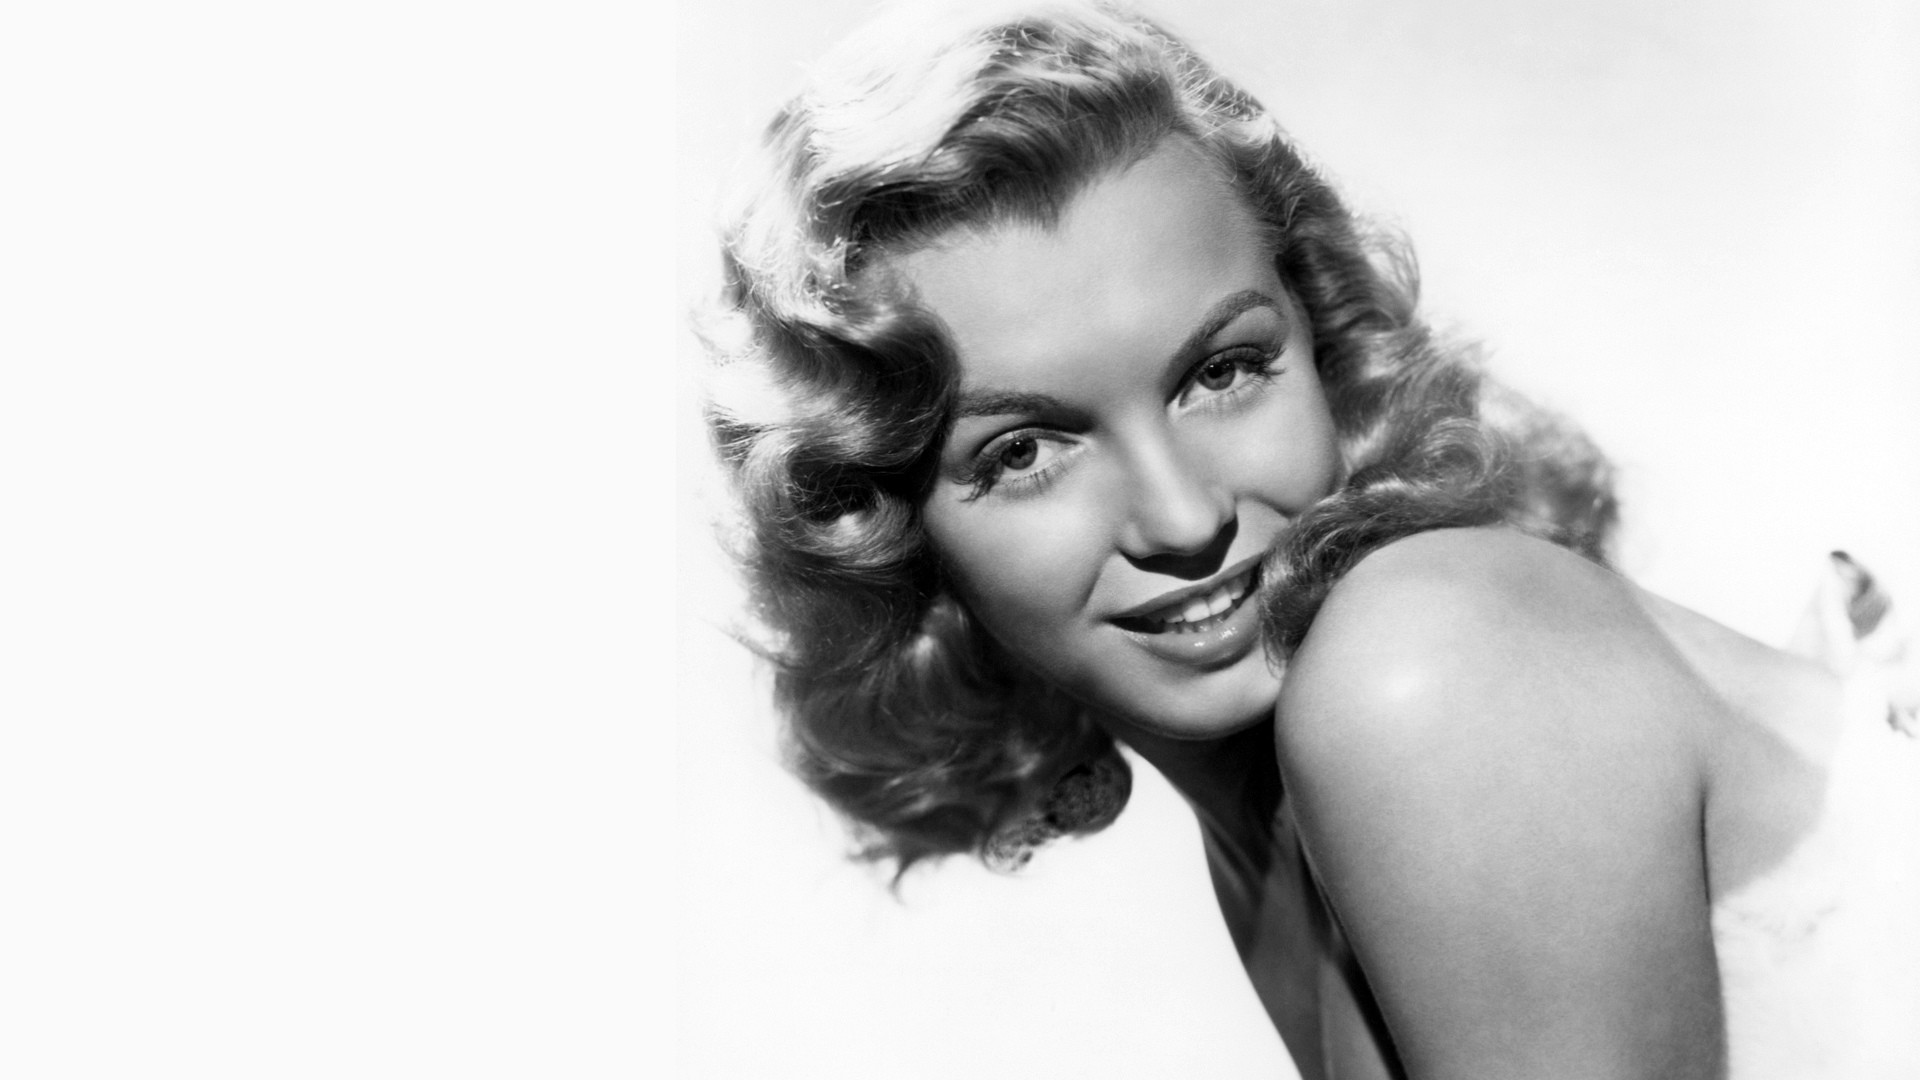 Res: 1920x1080, Marilyn Monroe Wallpaper 2901